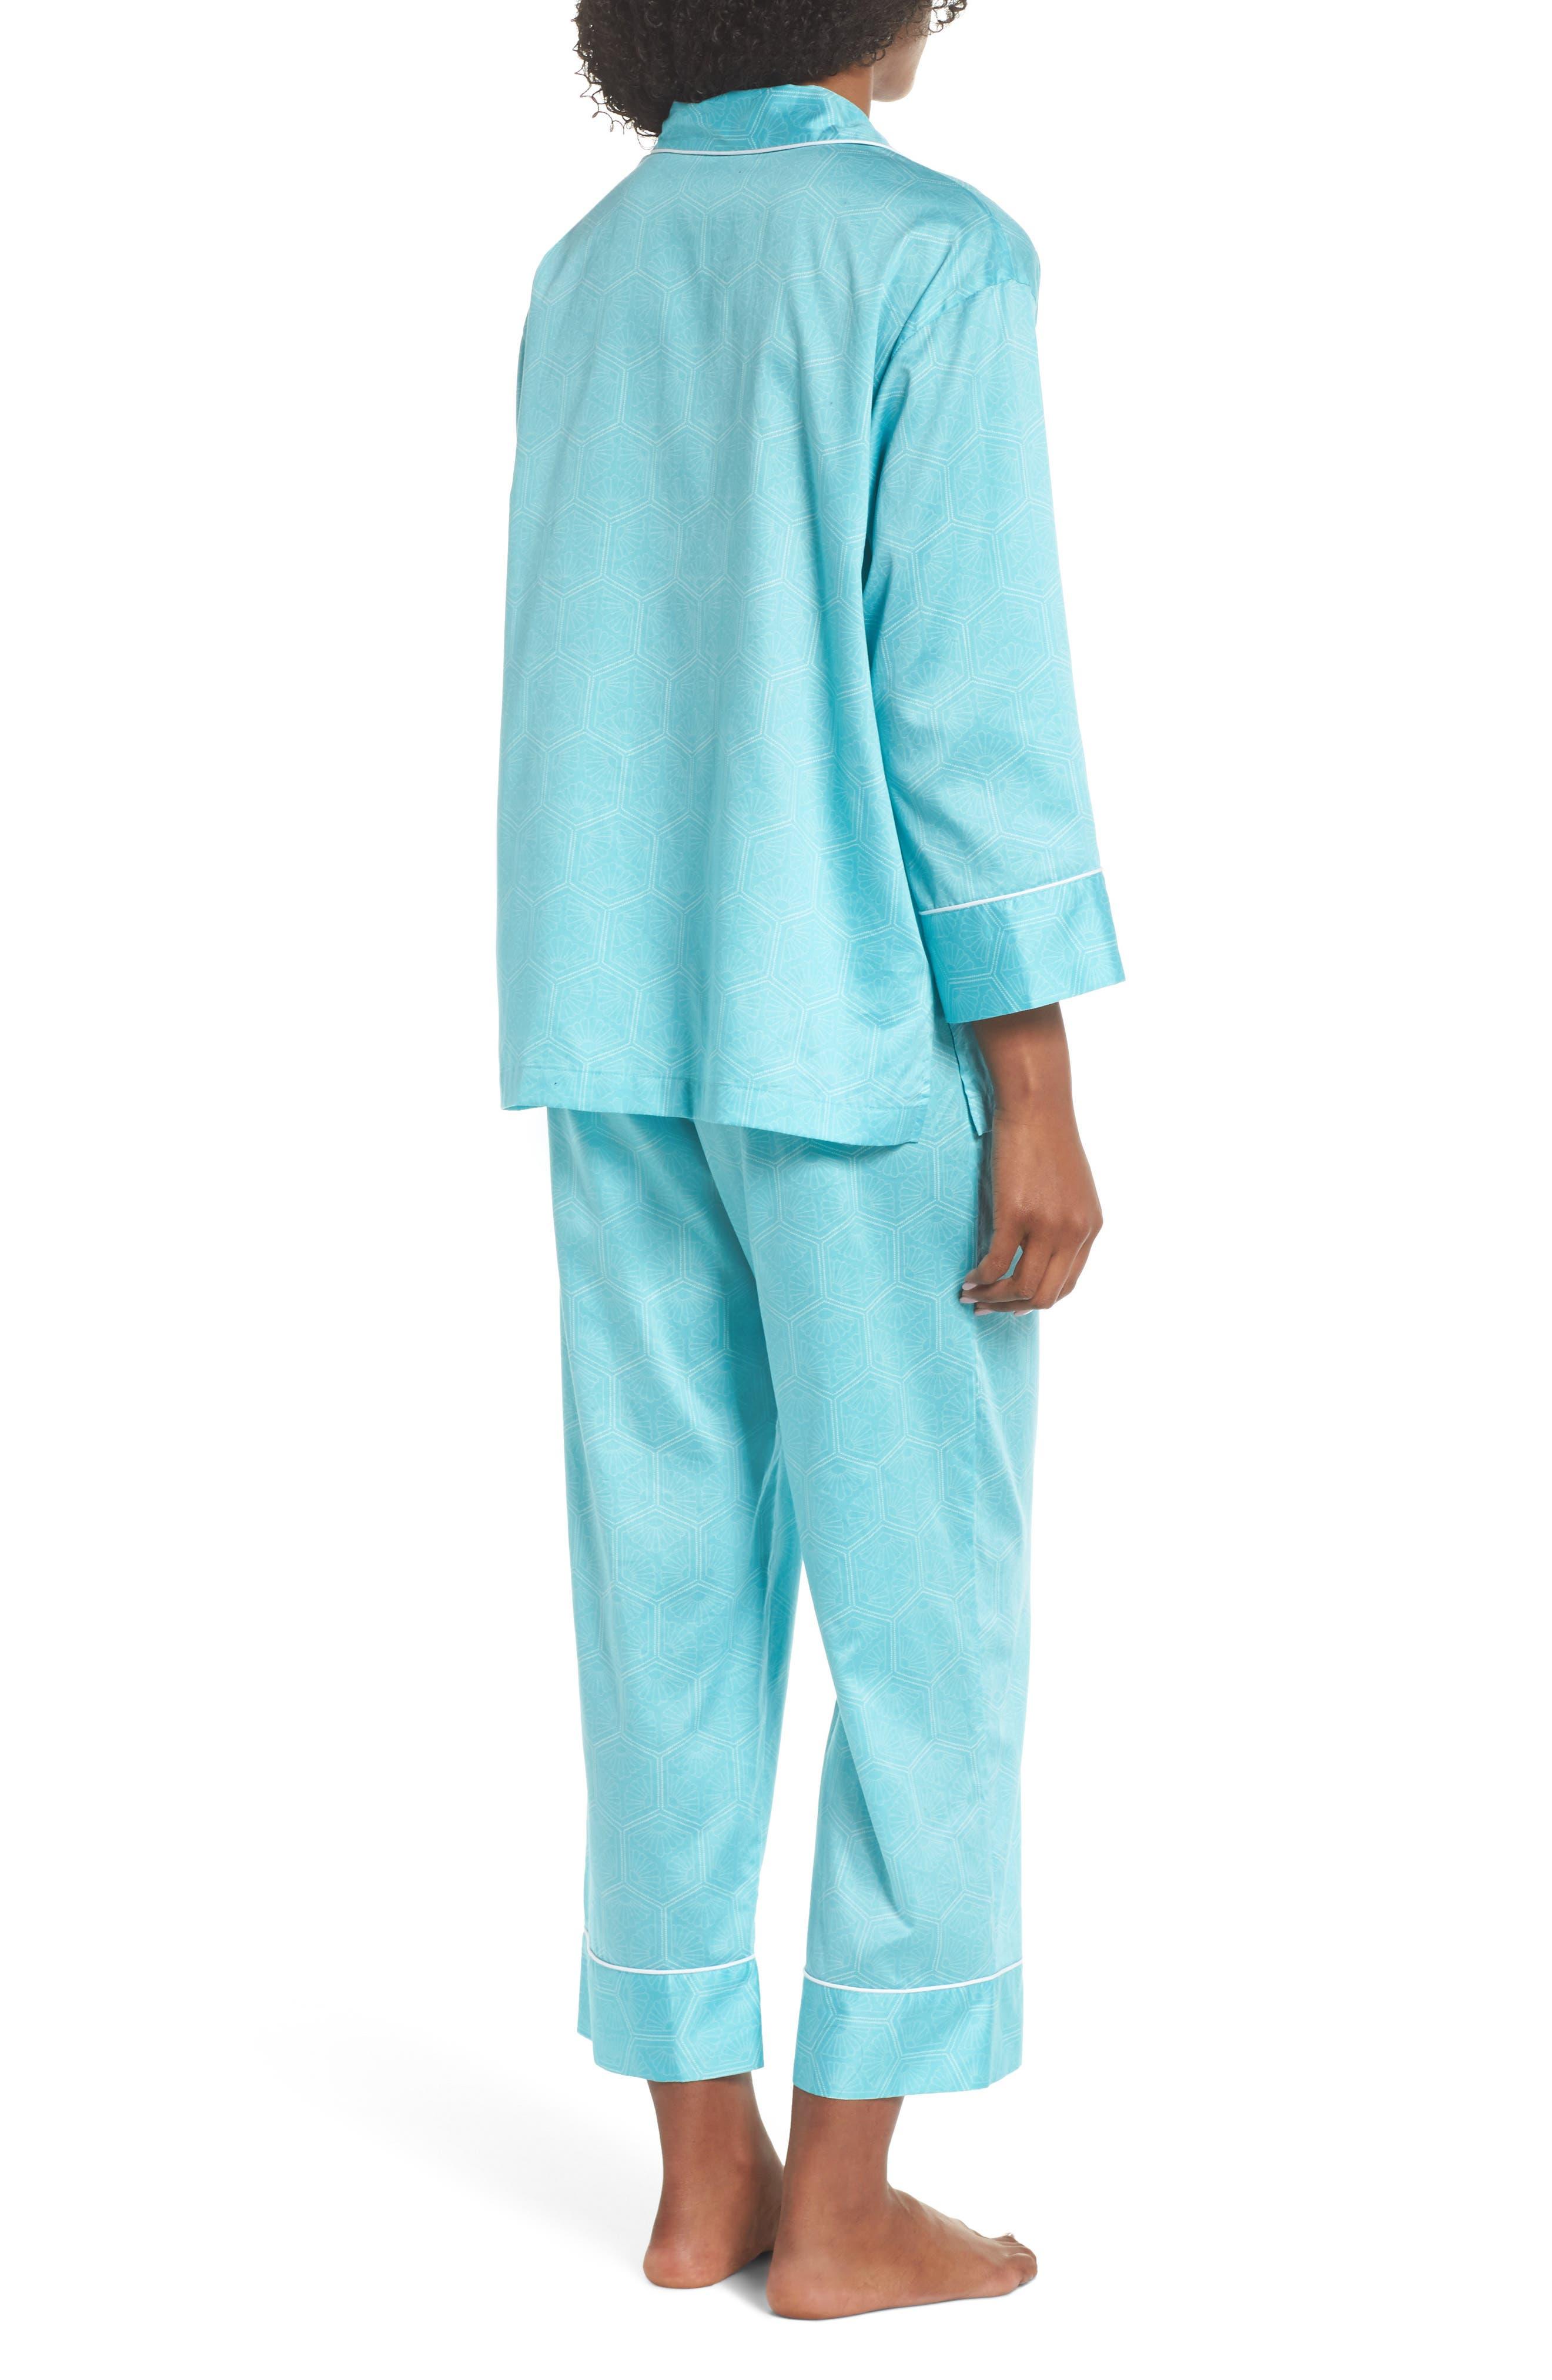 Fan Print Cotton Pajamas,                             Alternate thumbnail 2, color,                             Sea Glass